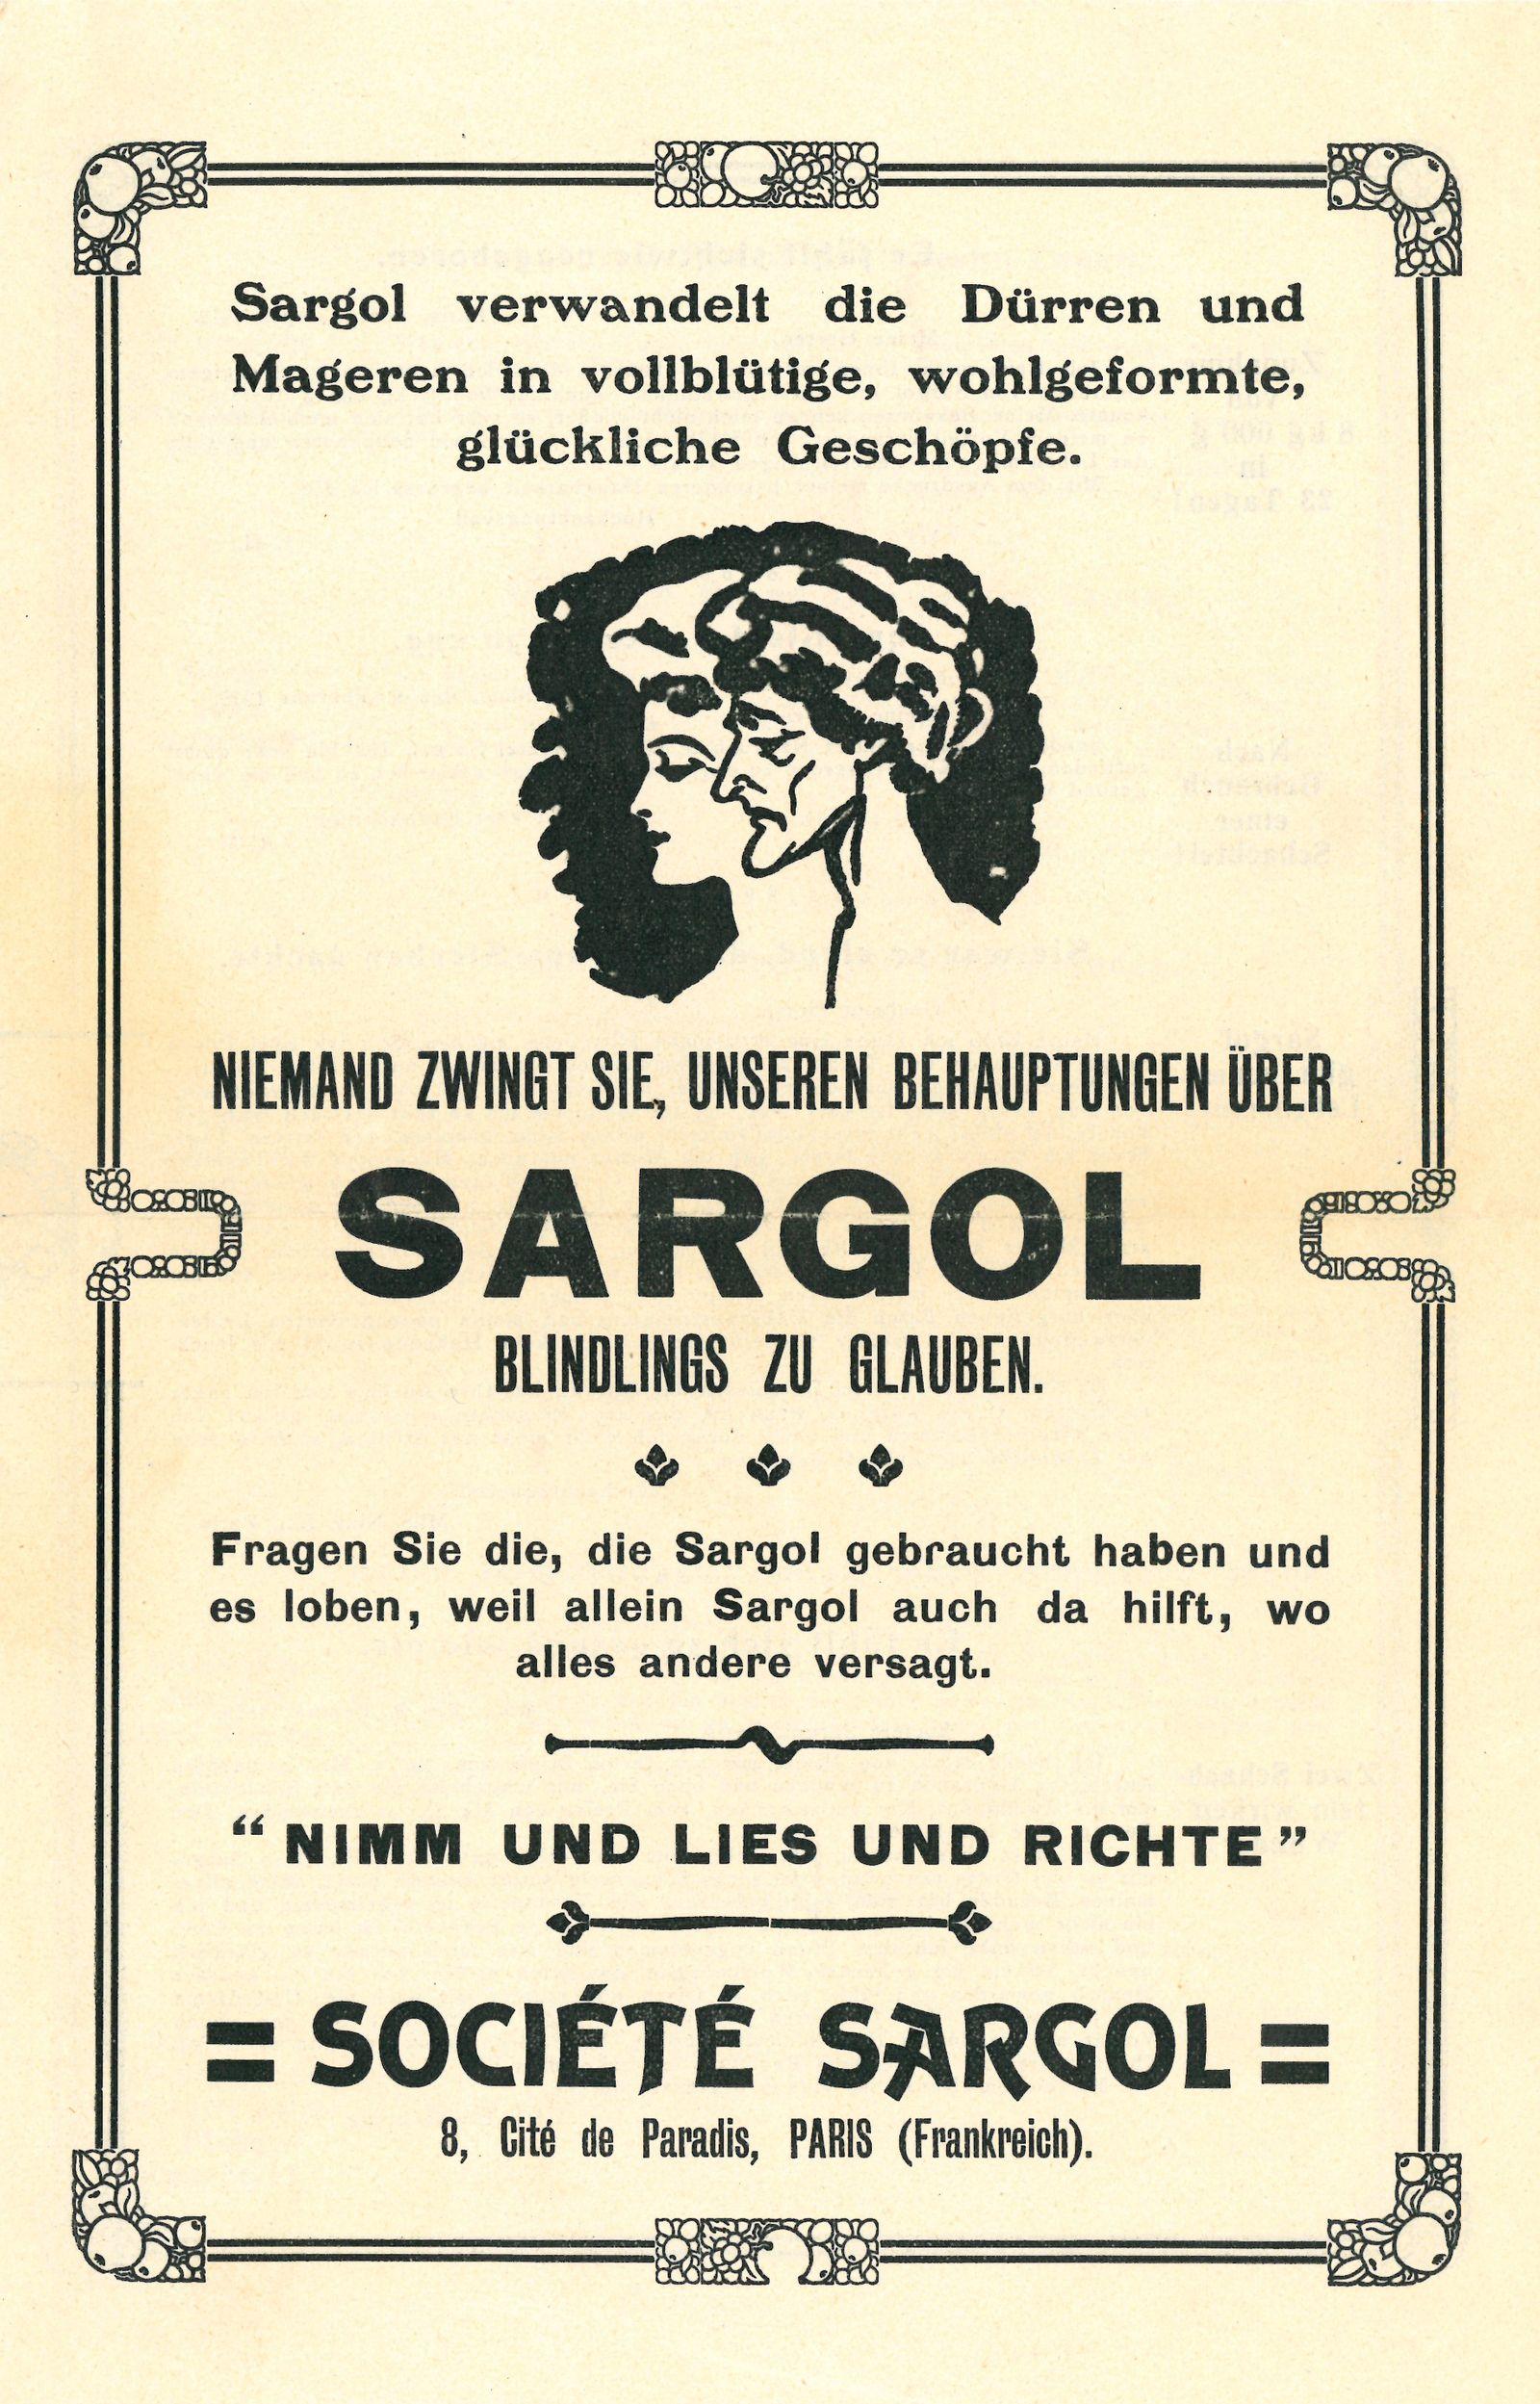 Wate On Werbung - Sargol